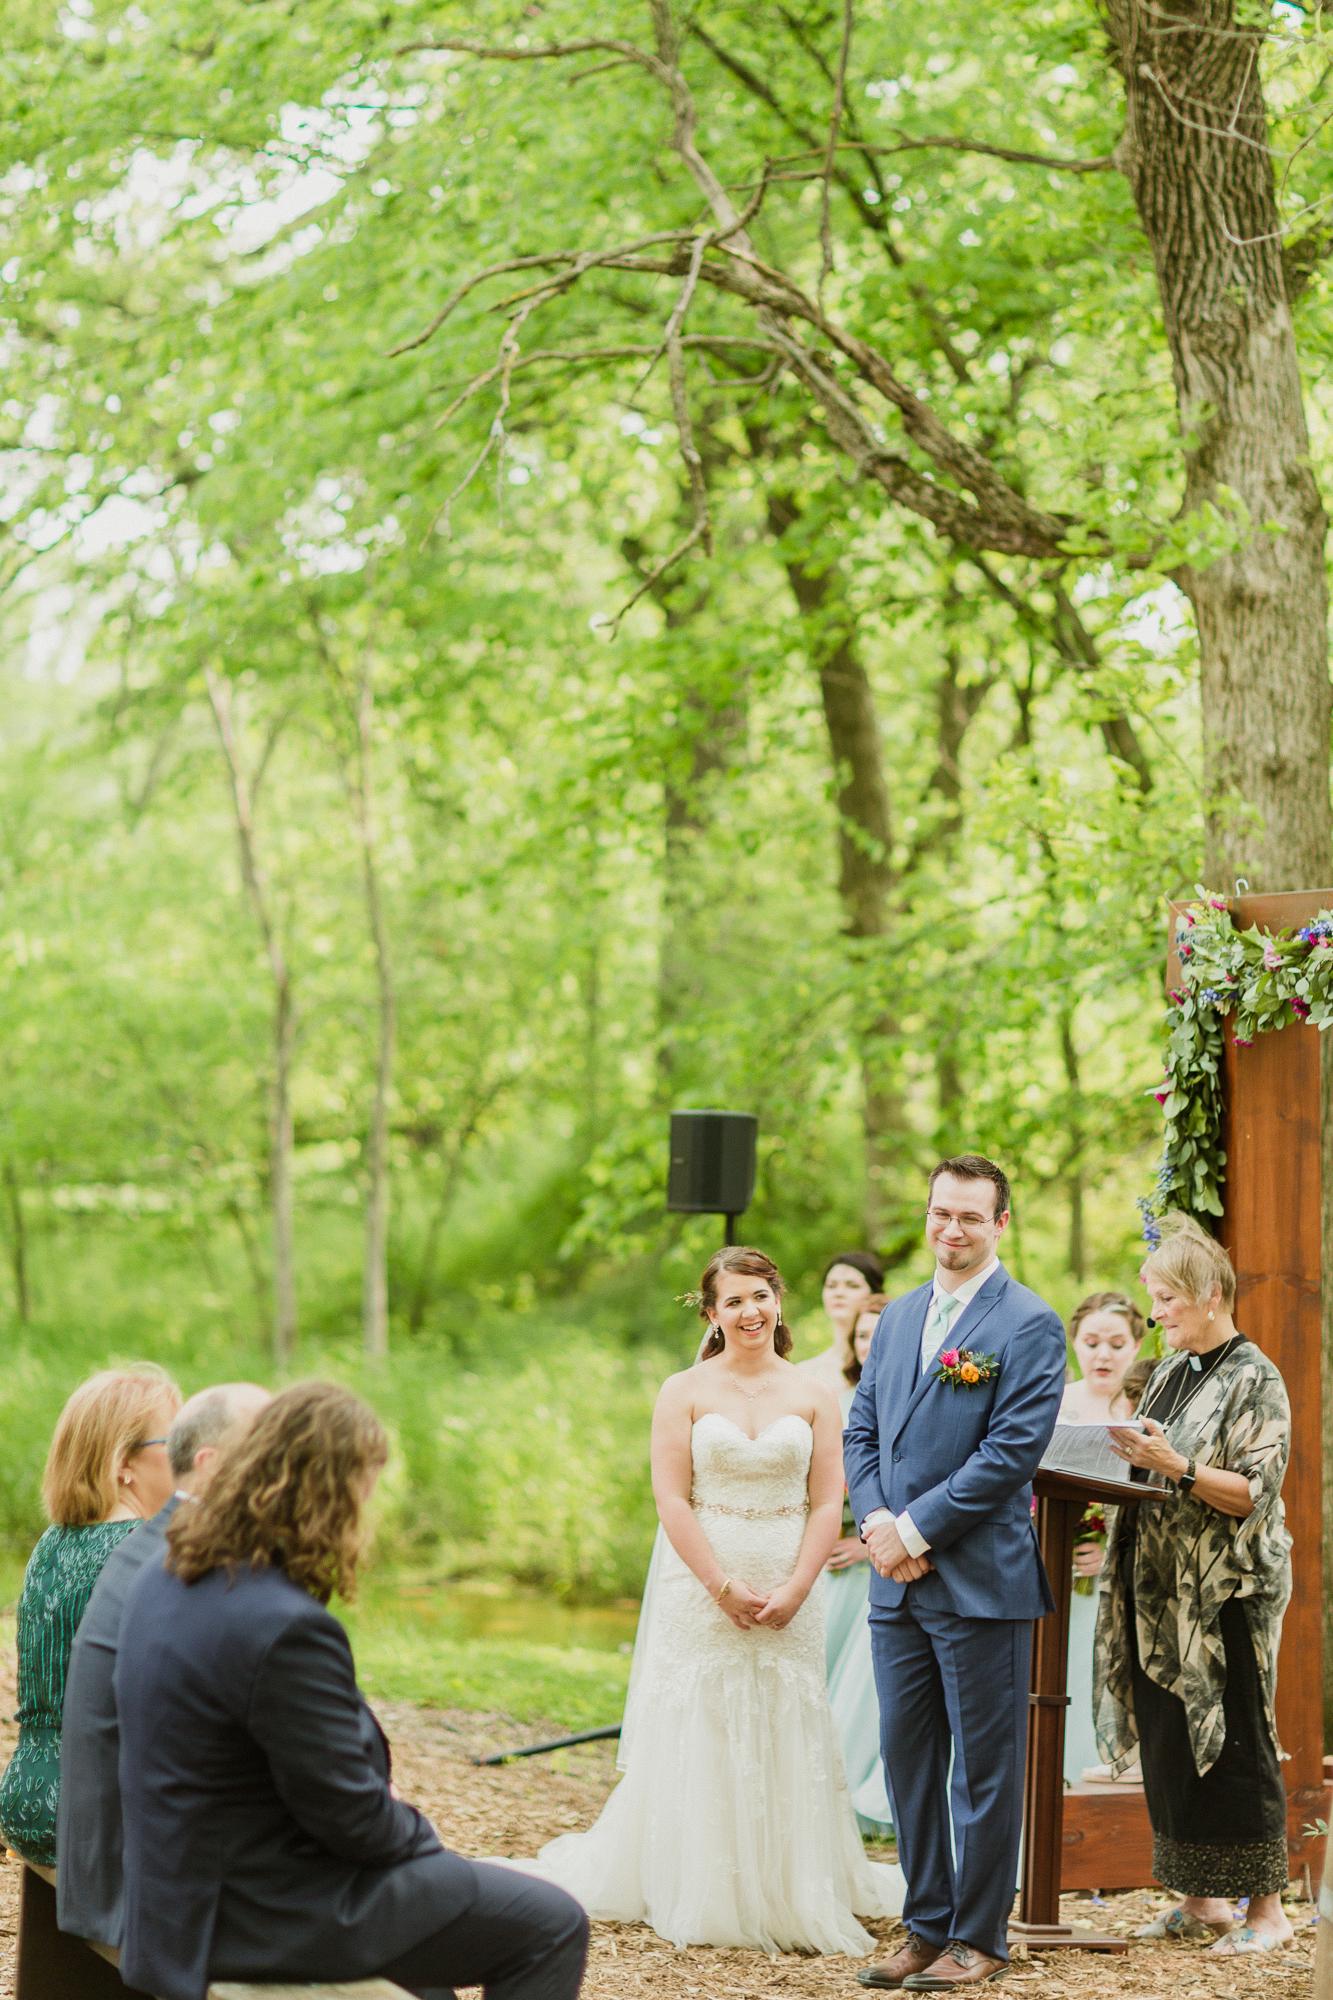 Colorful bohemian wedding photography at Golden Oak Farm-30.jpg